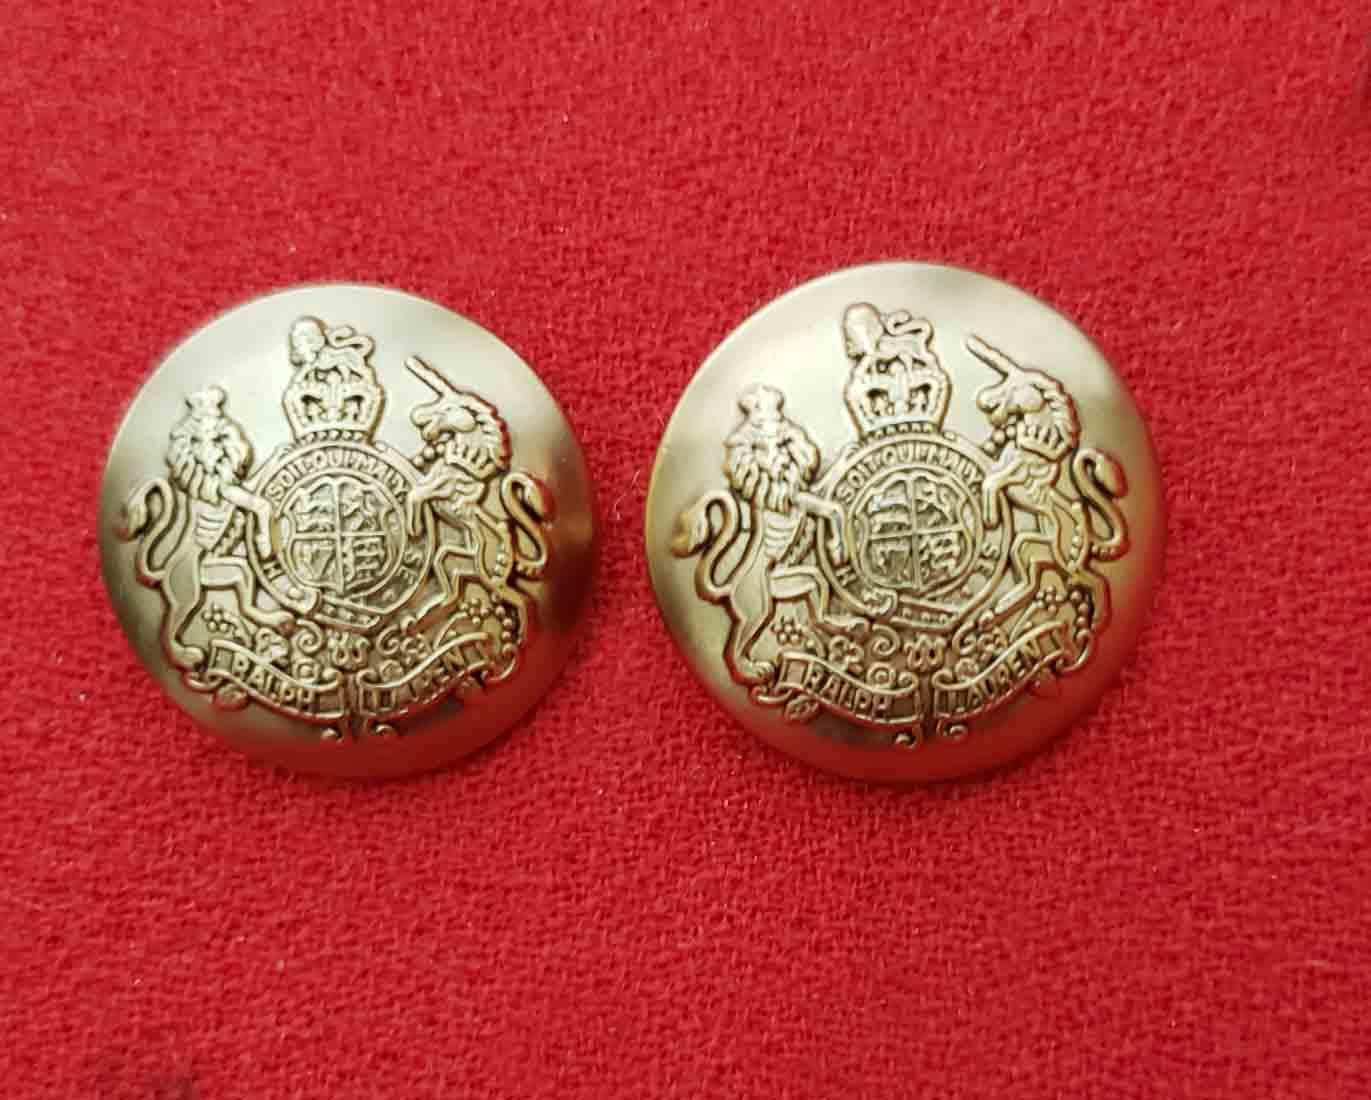 Two Large Vintage Ralph Lauren Dome Blazer Buttons Lion Unicorn Gold Brass Shank Men's